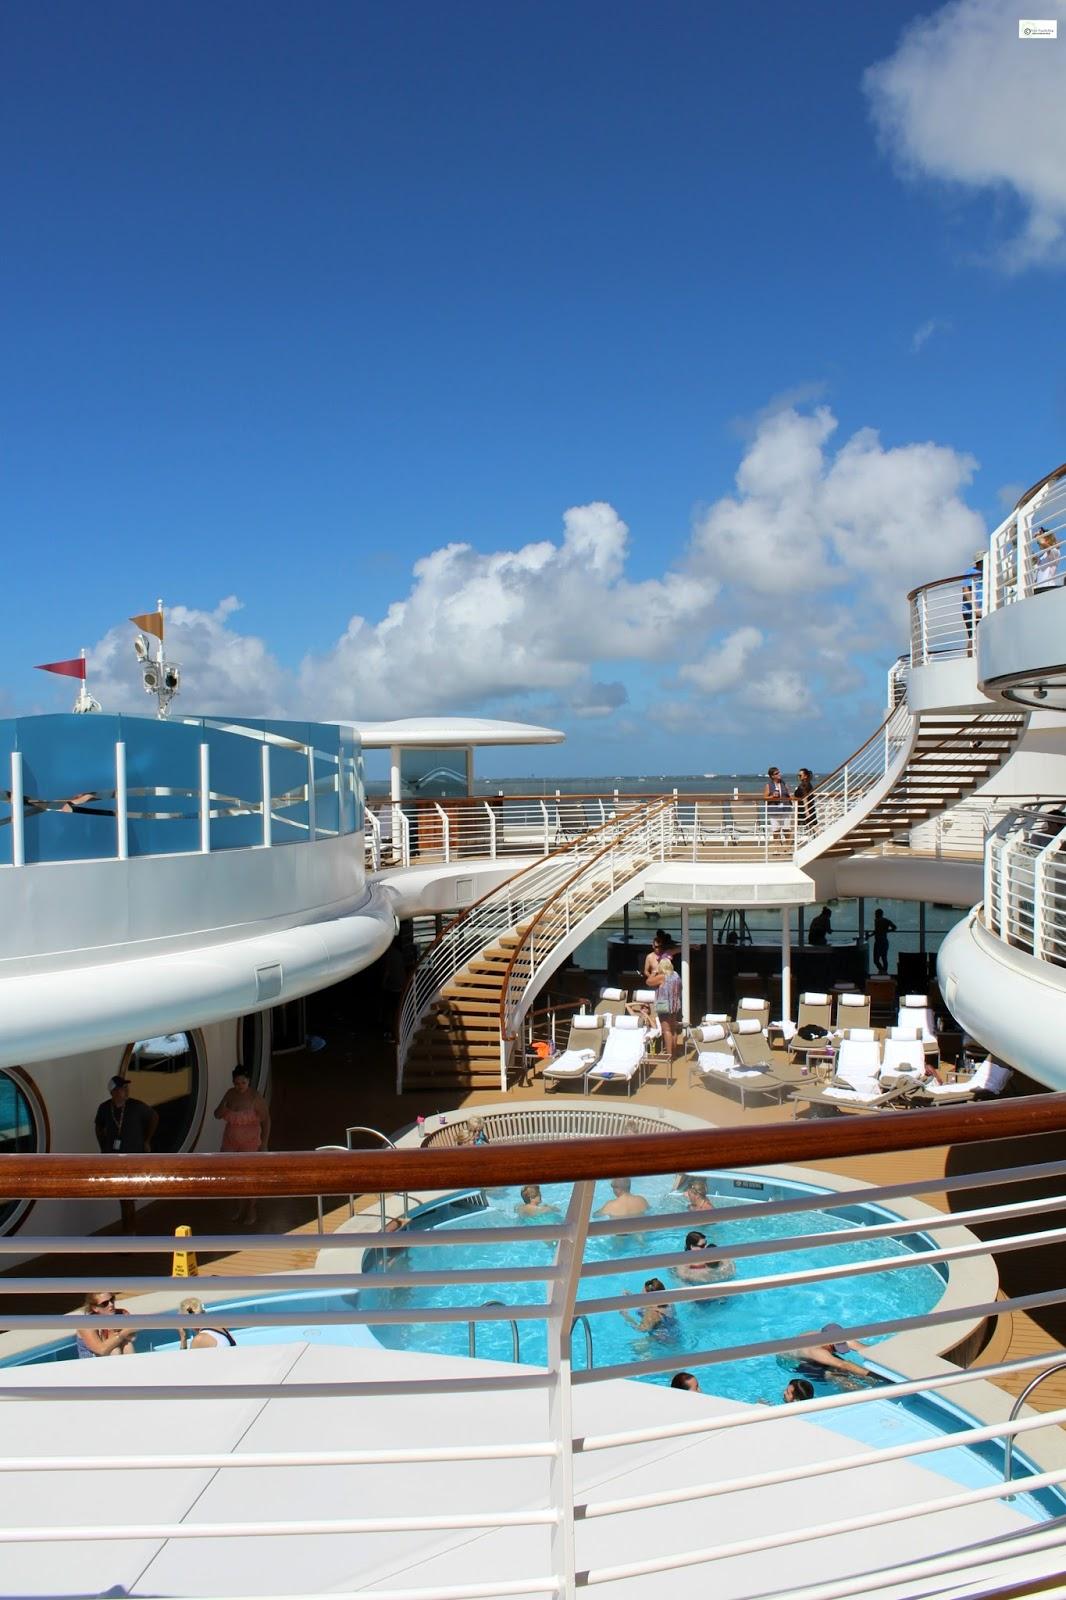 Caravan Sonnet Disney Dream Ship Review - Cruise ship songs